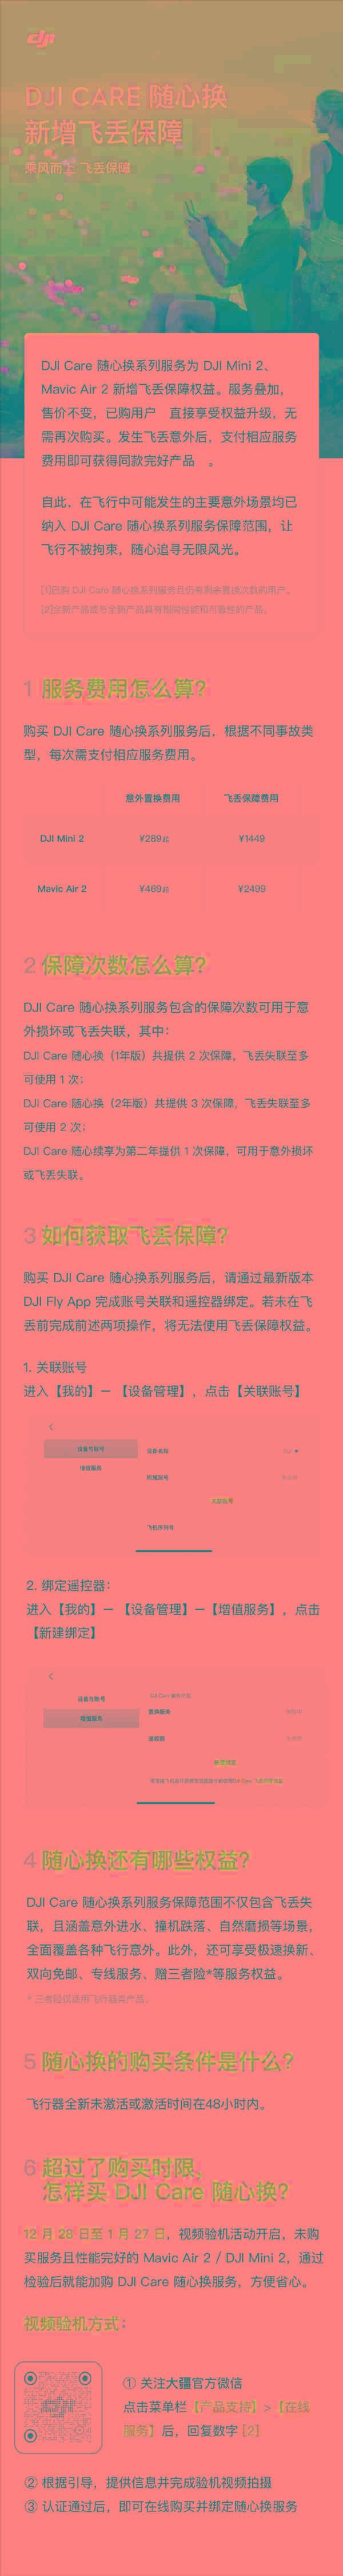 usdt回收(caibao.it):加量不加价 (大疆升级)DJI Care服务:新增飞丢保障权益 第3张